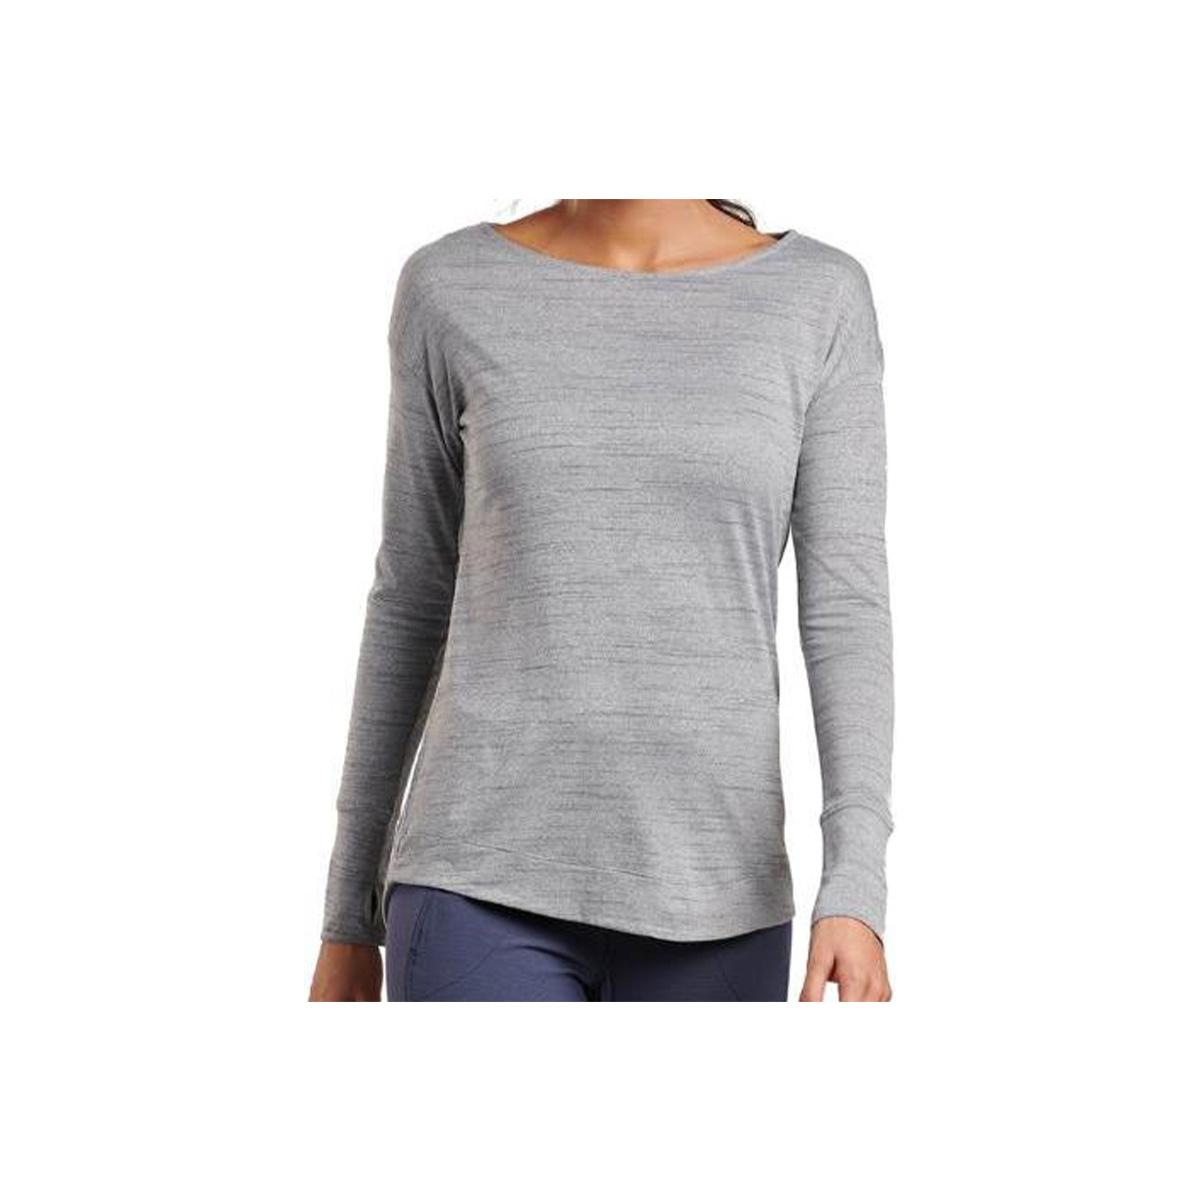 Kuhl Women's Intent Krossback Long Sleeve